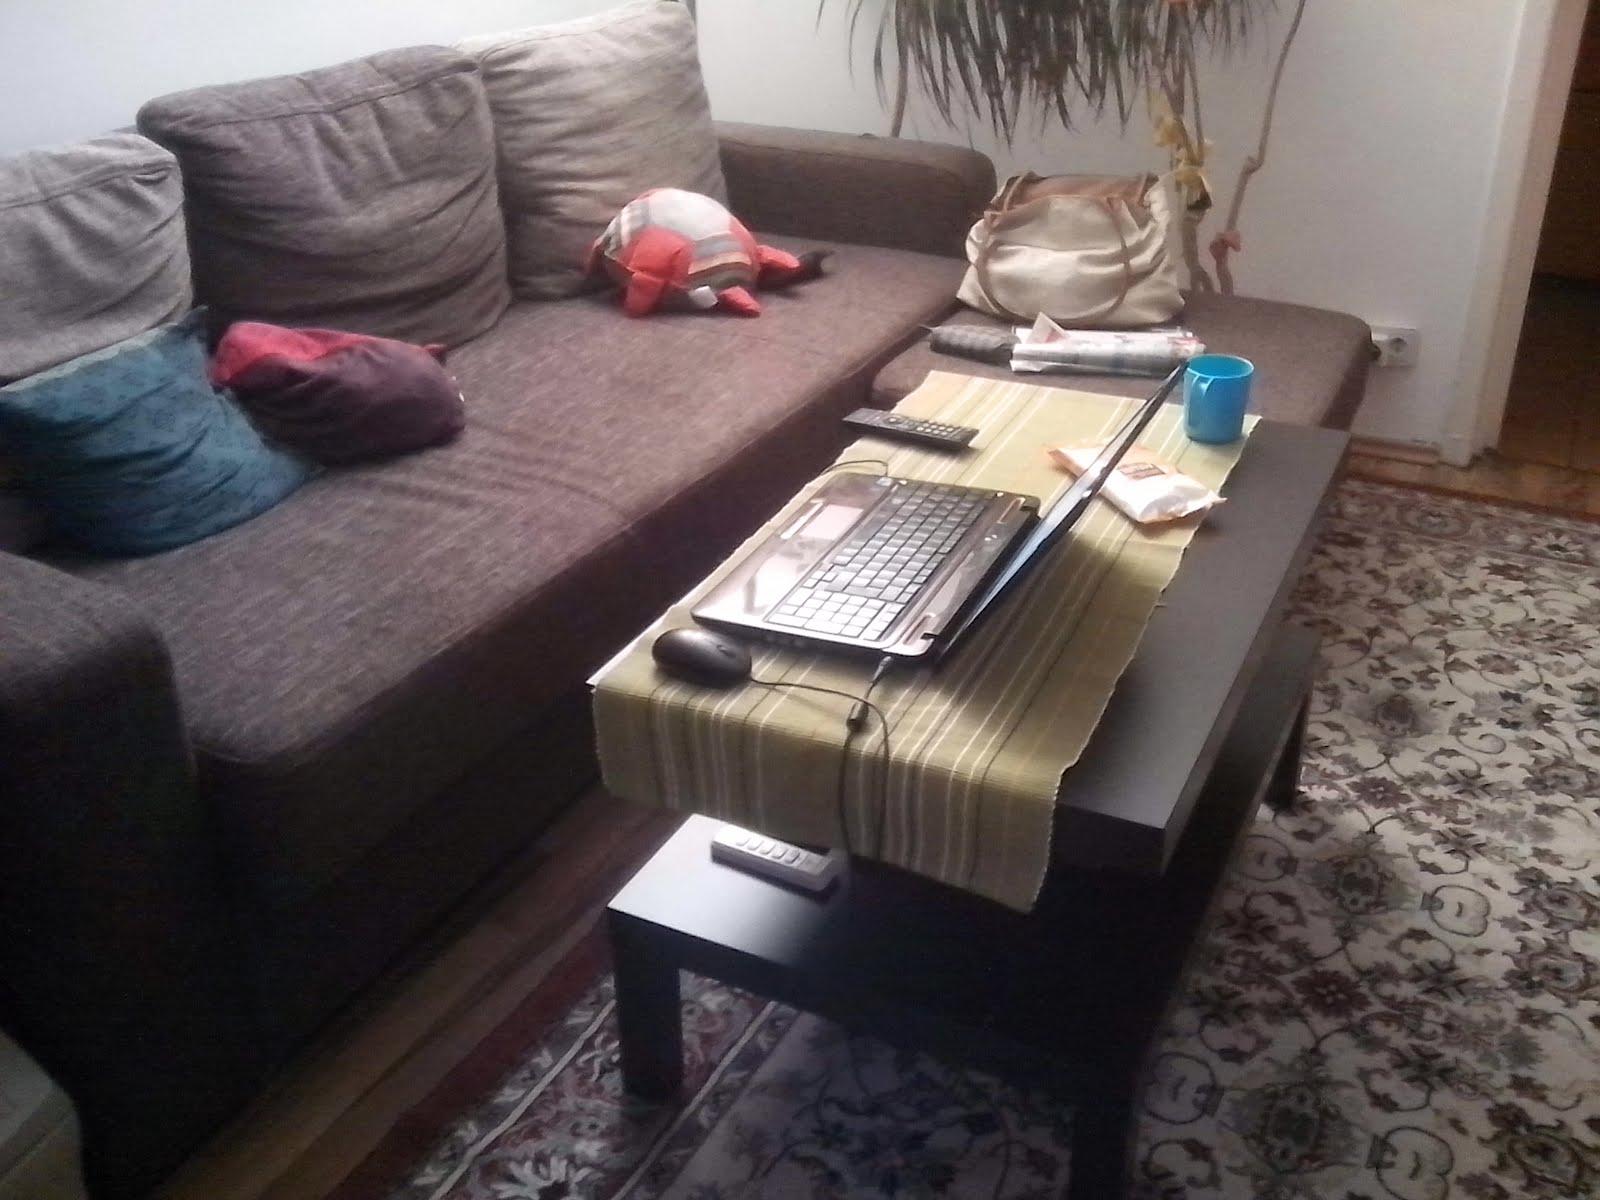 - Focus Company-employee: IKEA Hackers: Lift Top Coffee Table